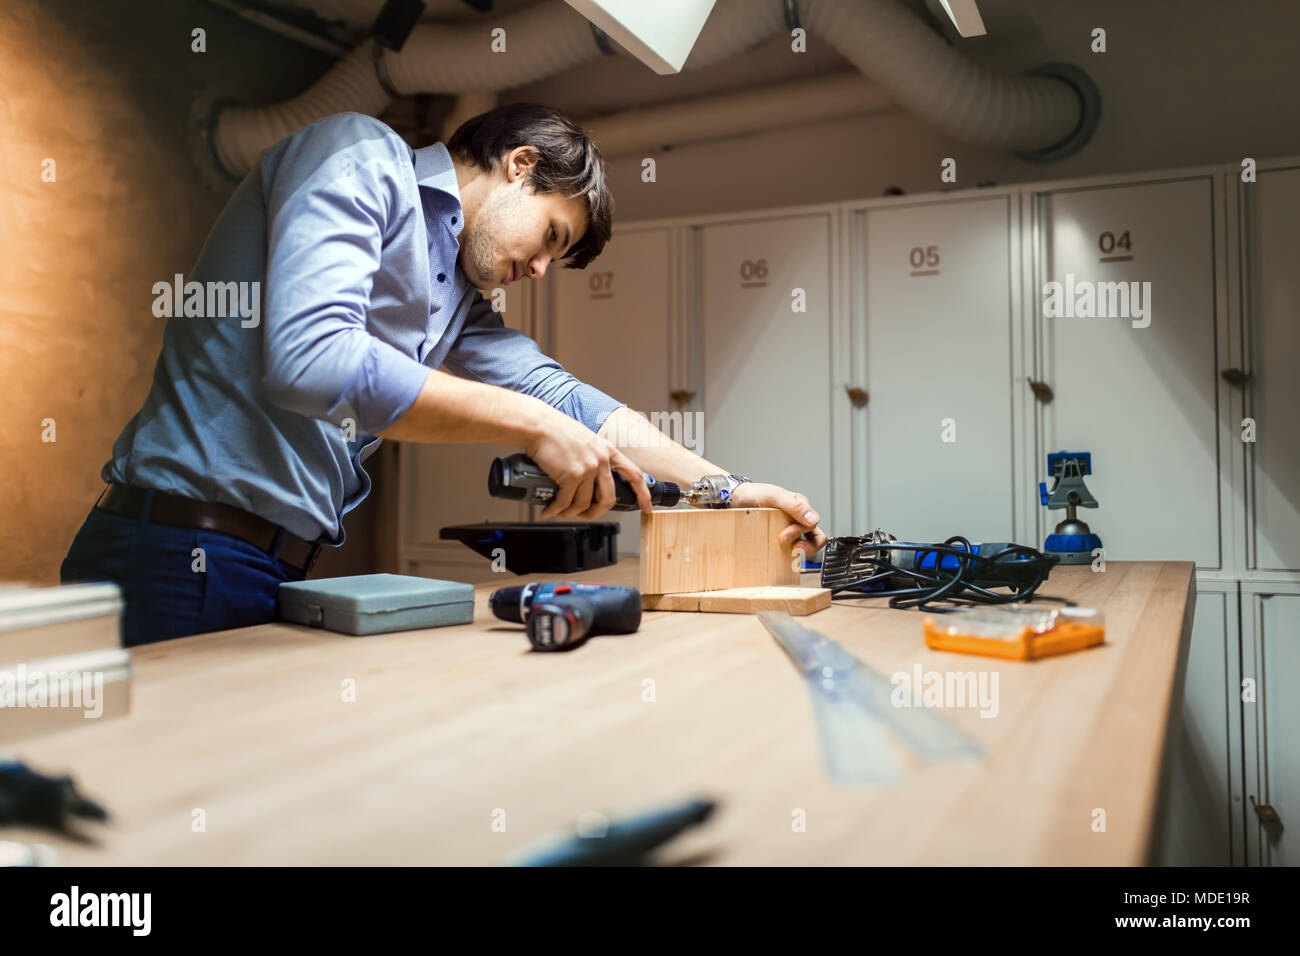 handyman stockfotos handyman bilder alamy. Black Bedroom Furniture Sets. Home Design Ideas